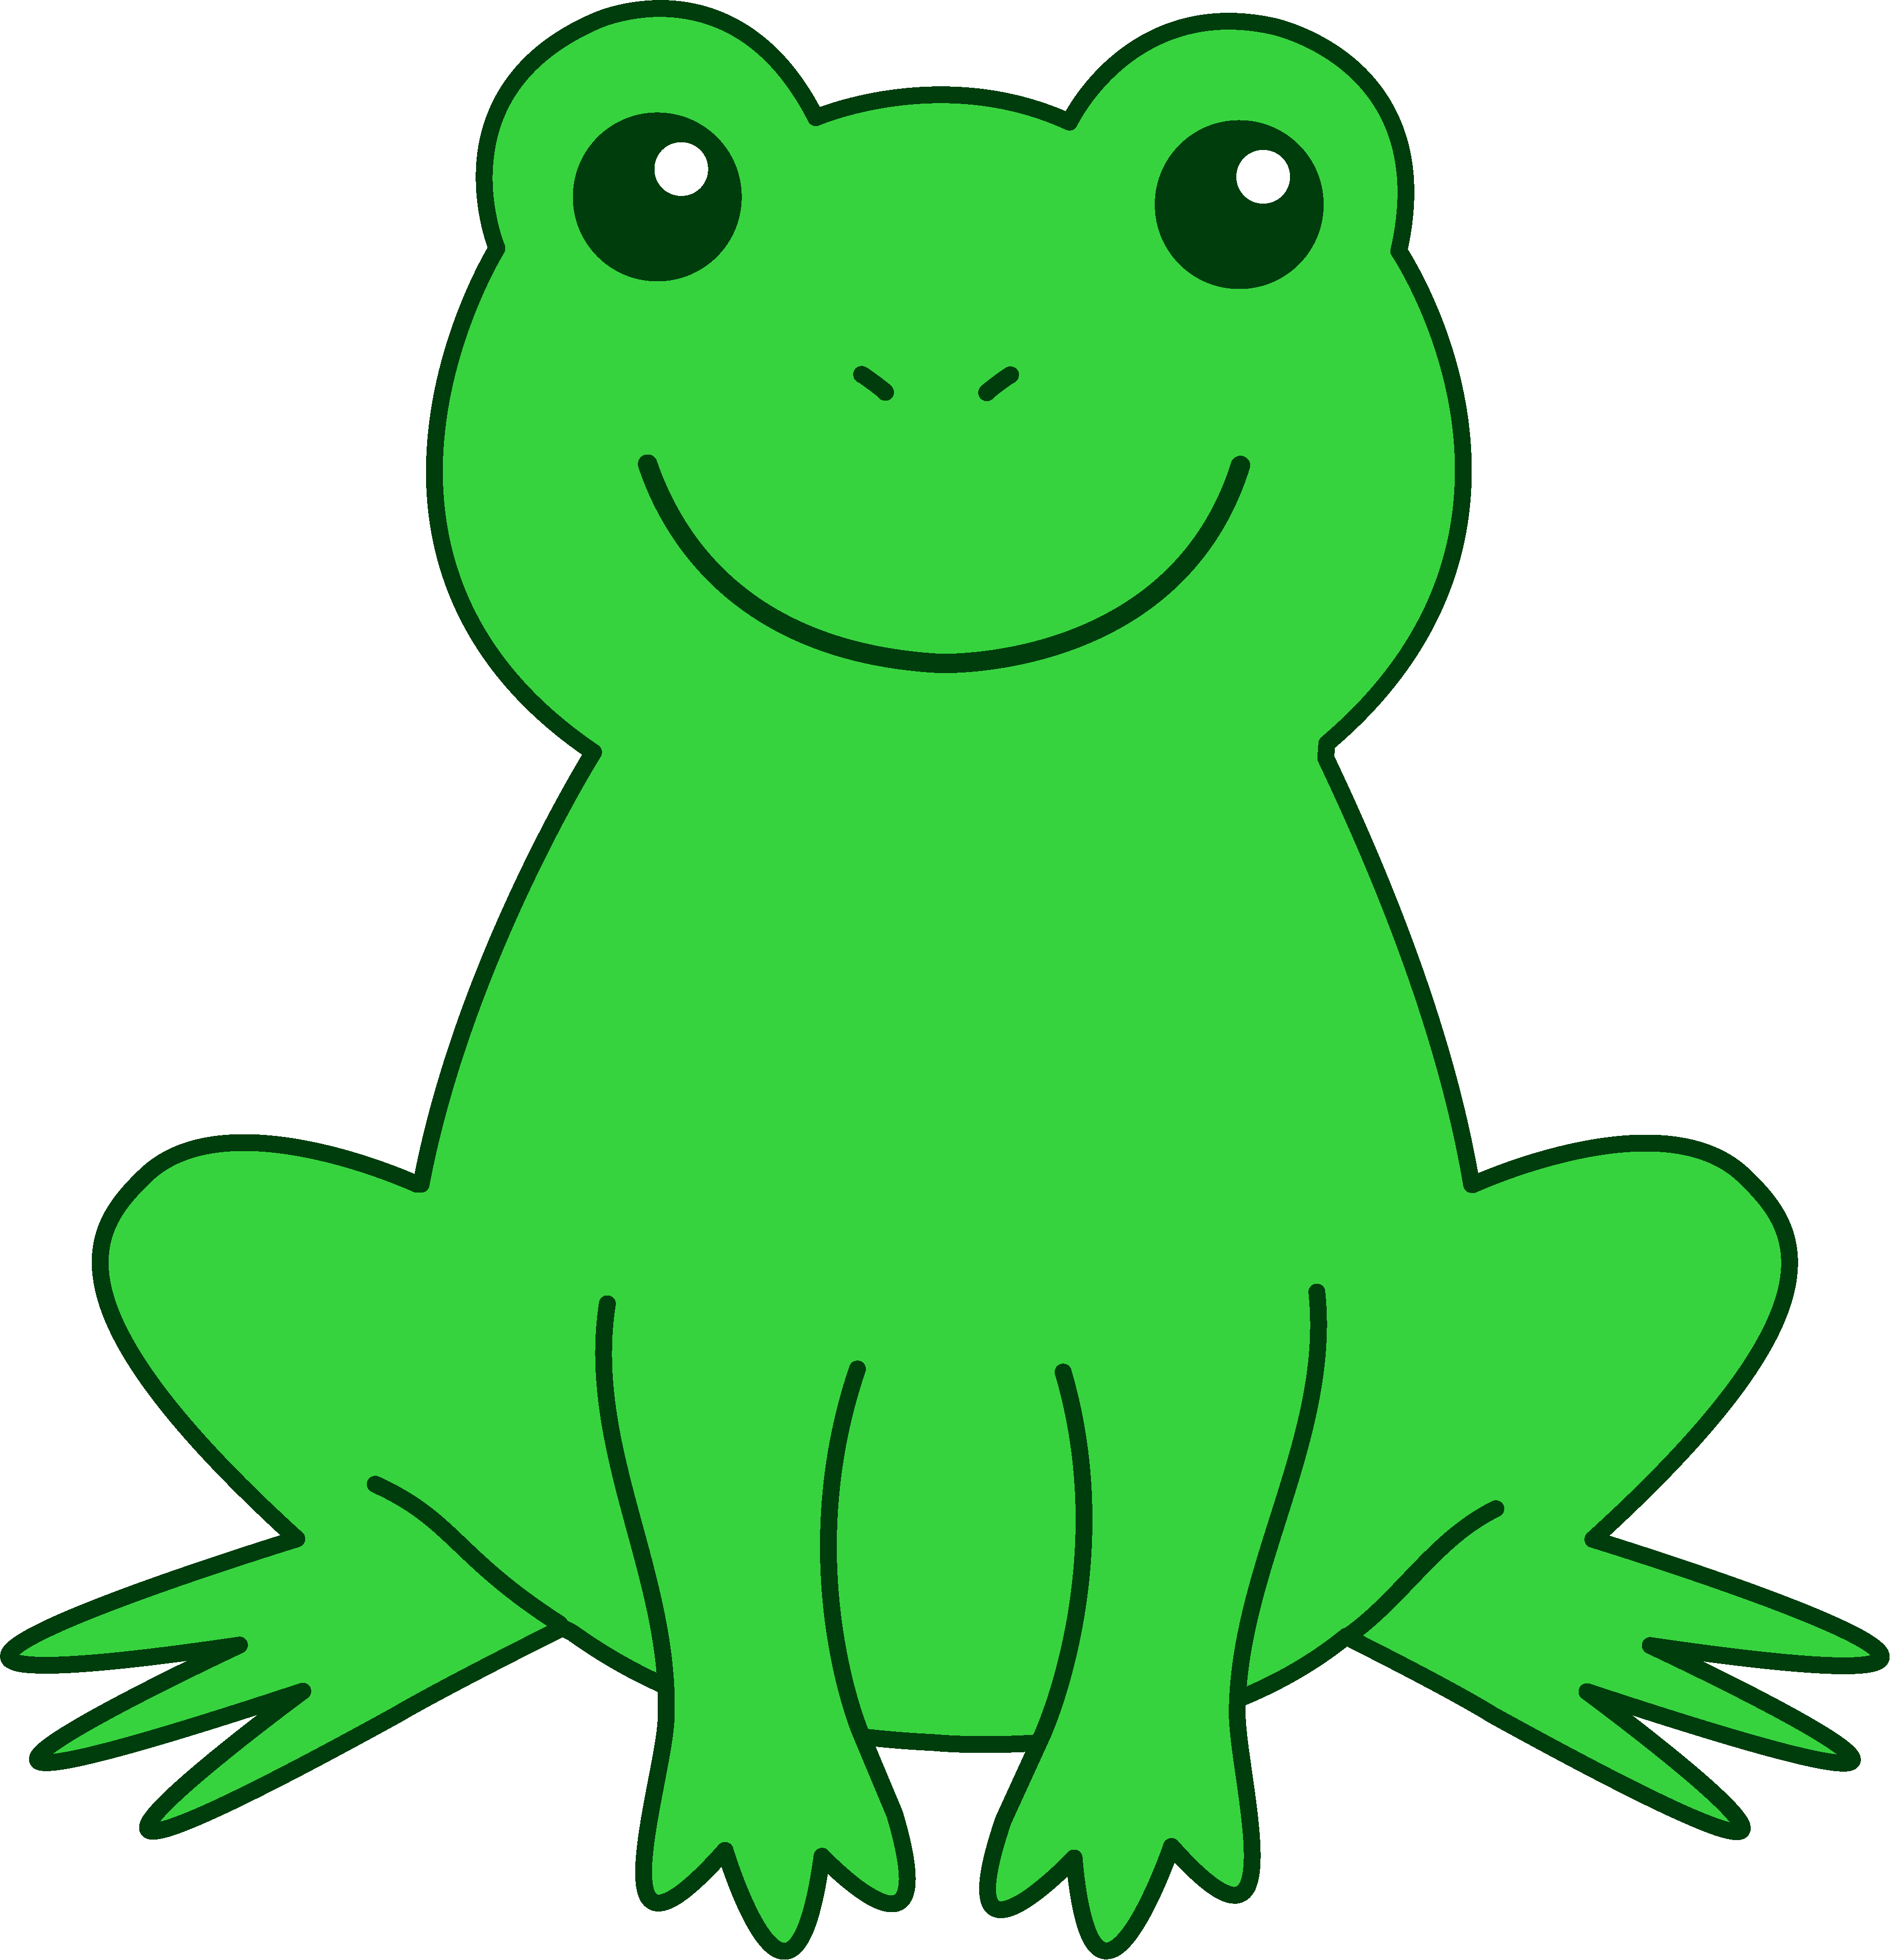 Cartoon 4 Frog Images - ClipArt Best